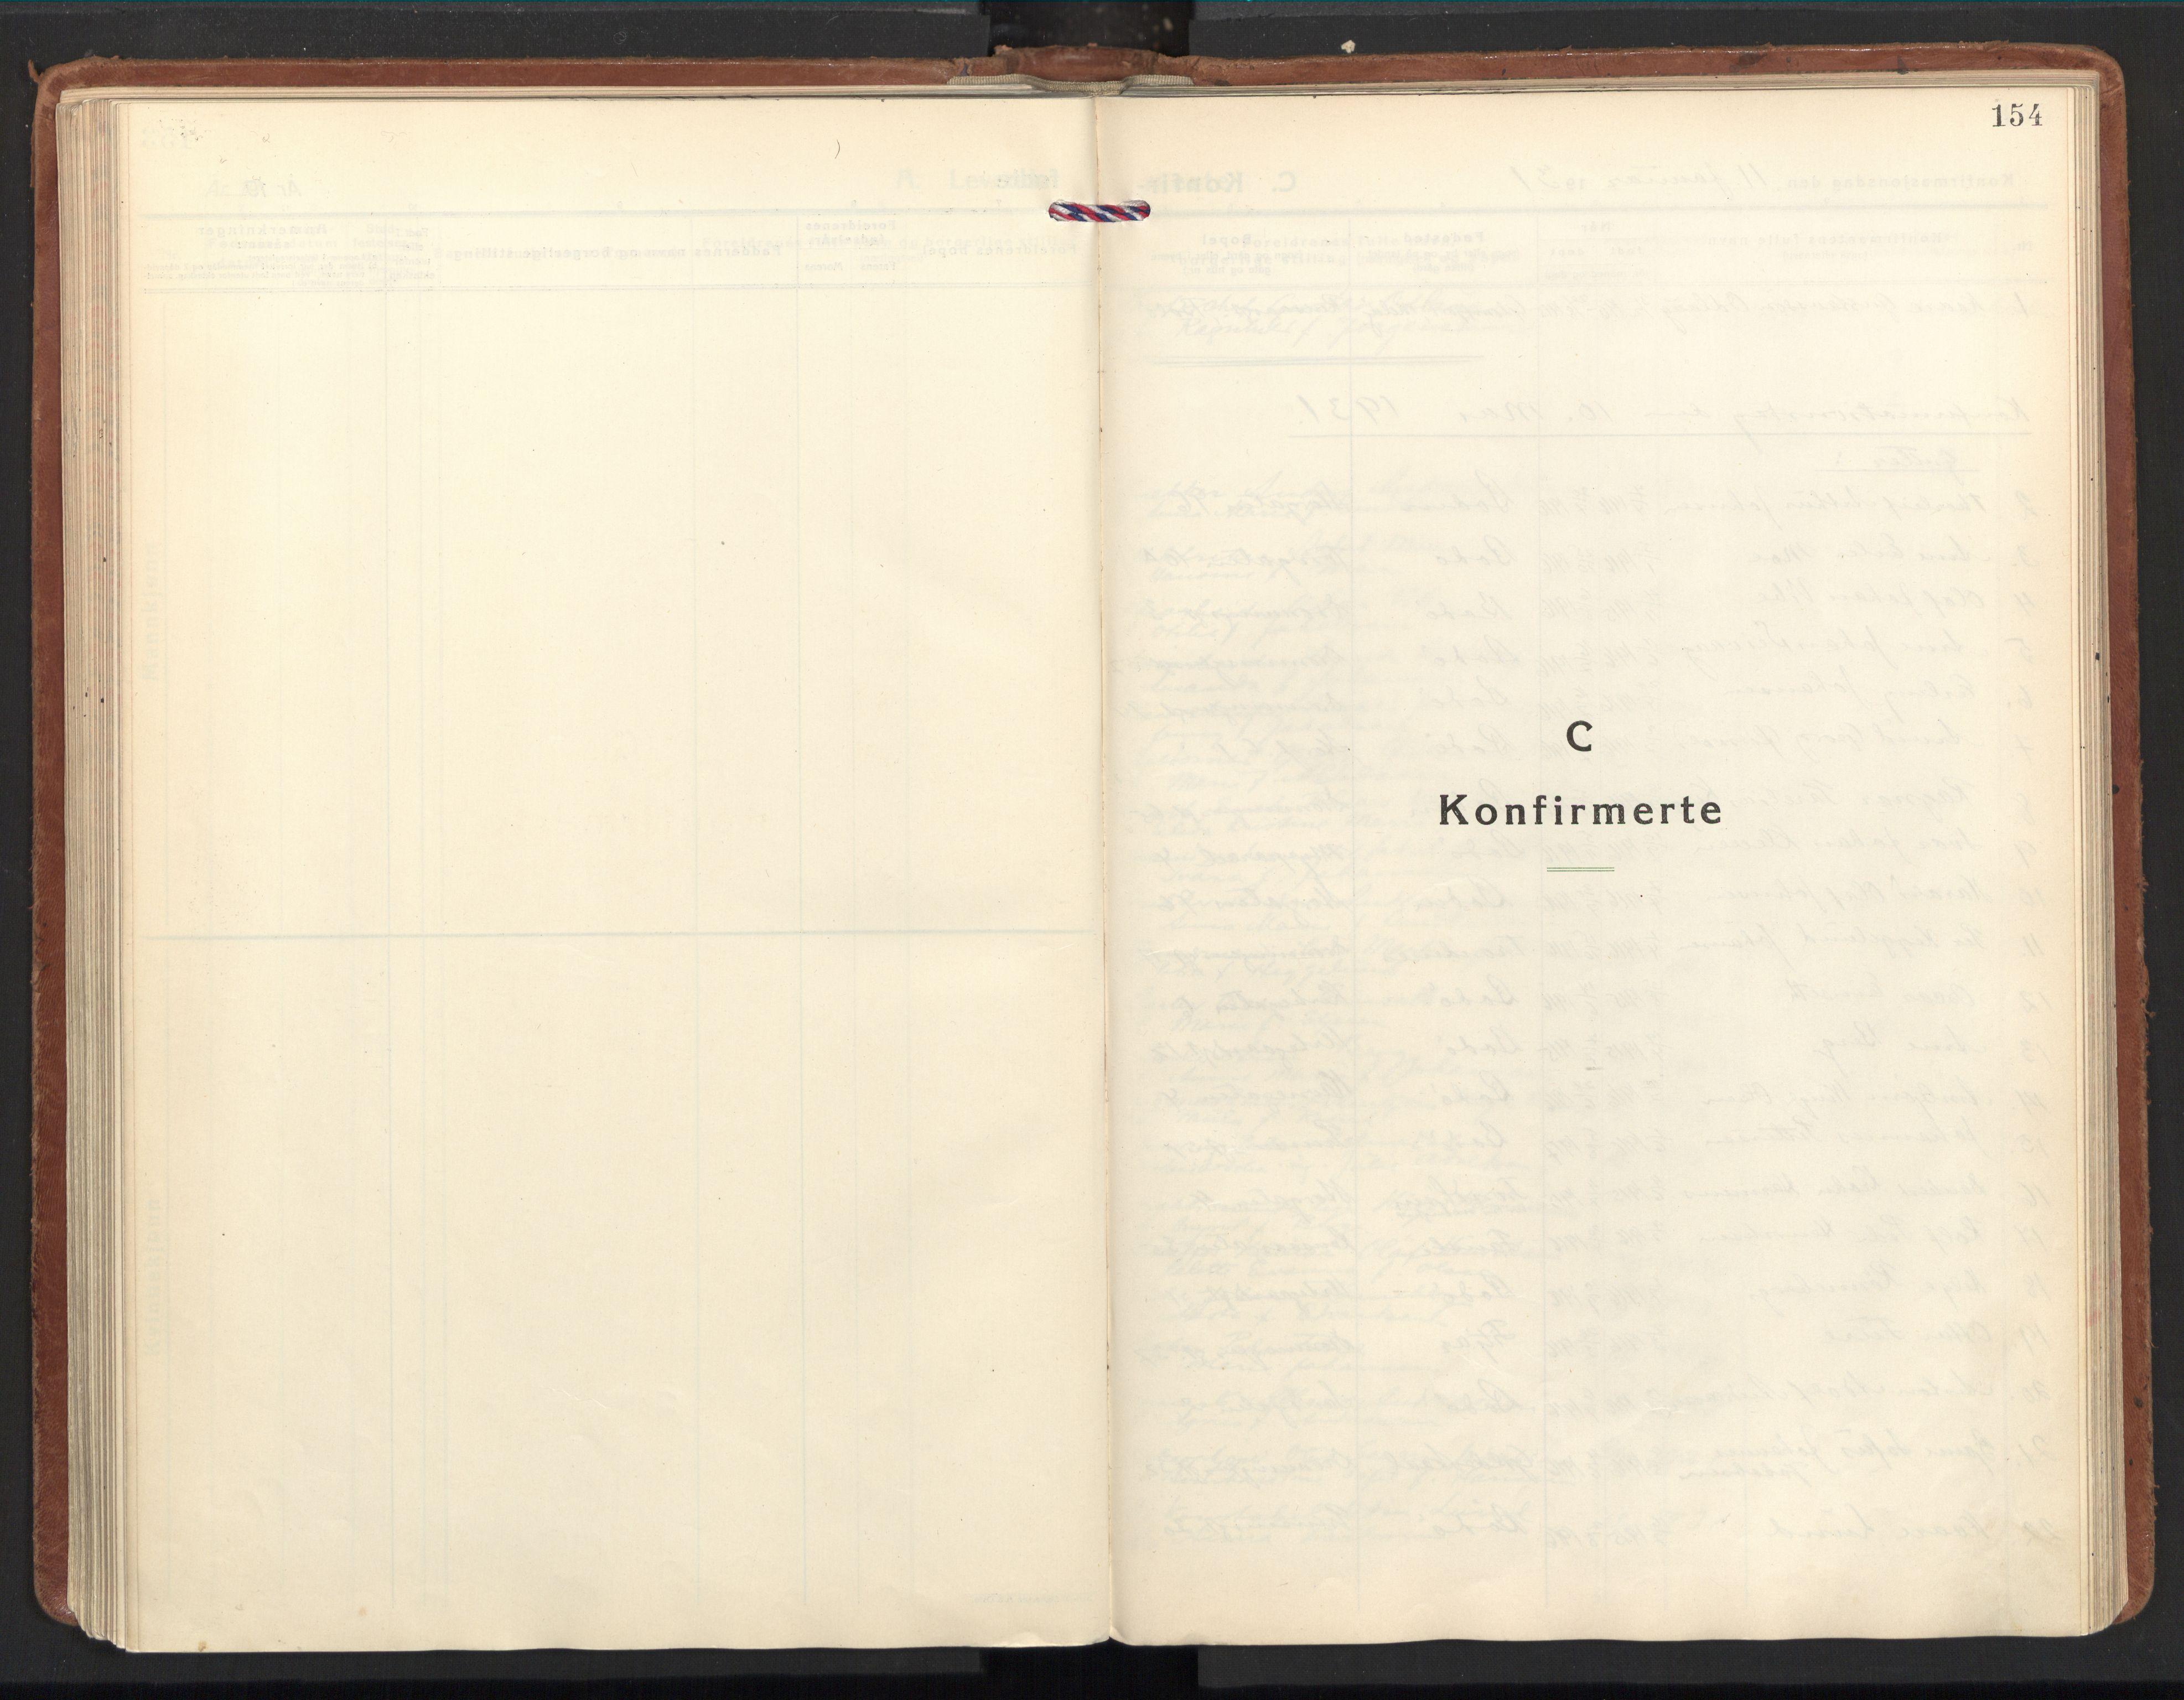 SAT, Ministerialprotokoller, klokkerbøker og fødselsregistre - Nordland, 801/L0019: Ministerialbok nr. 801A19, 1930-1940, s. 154